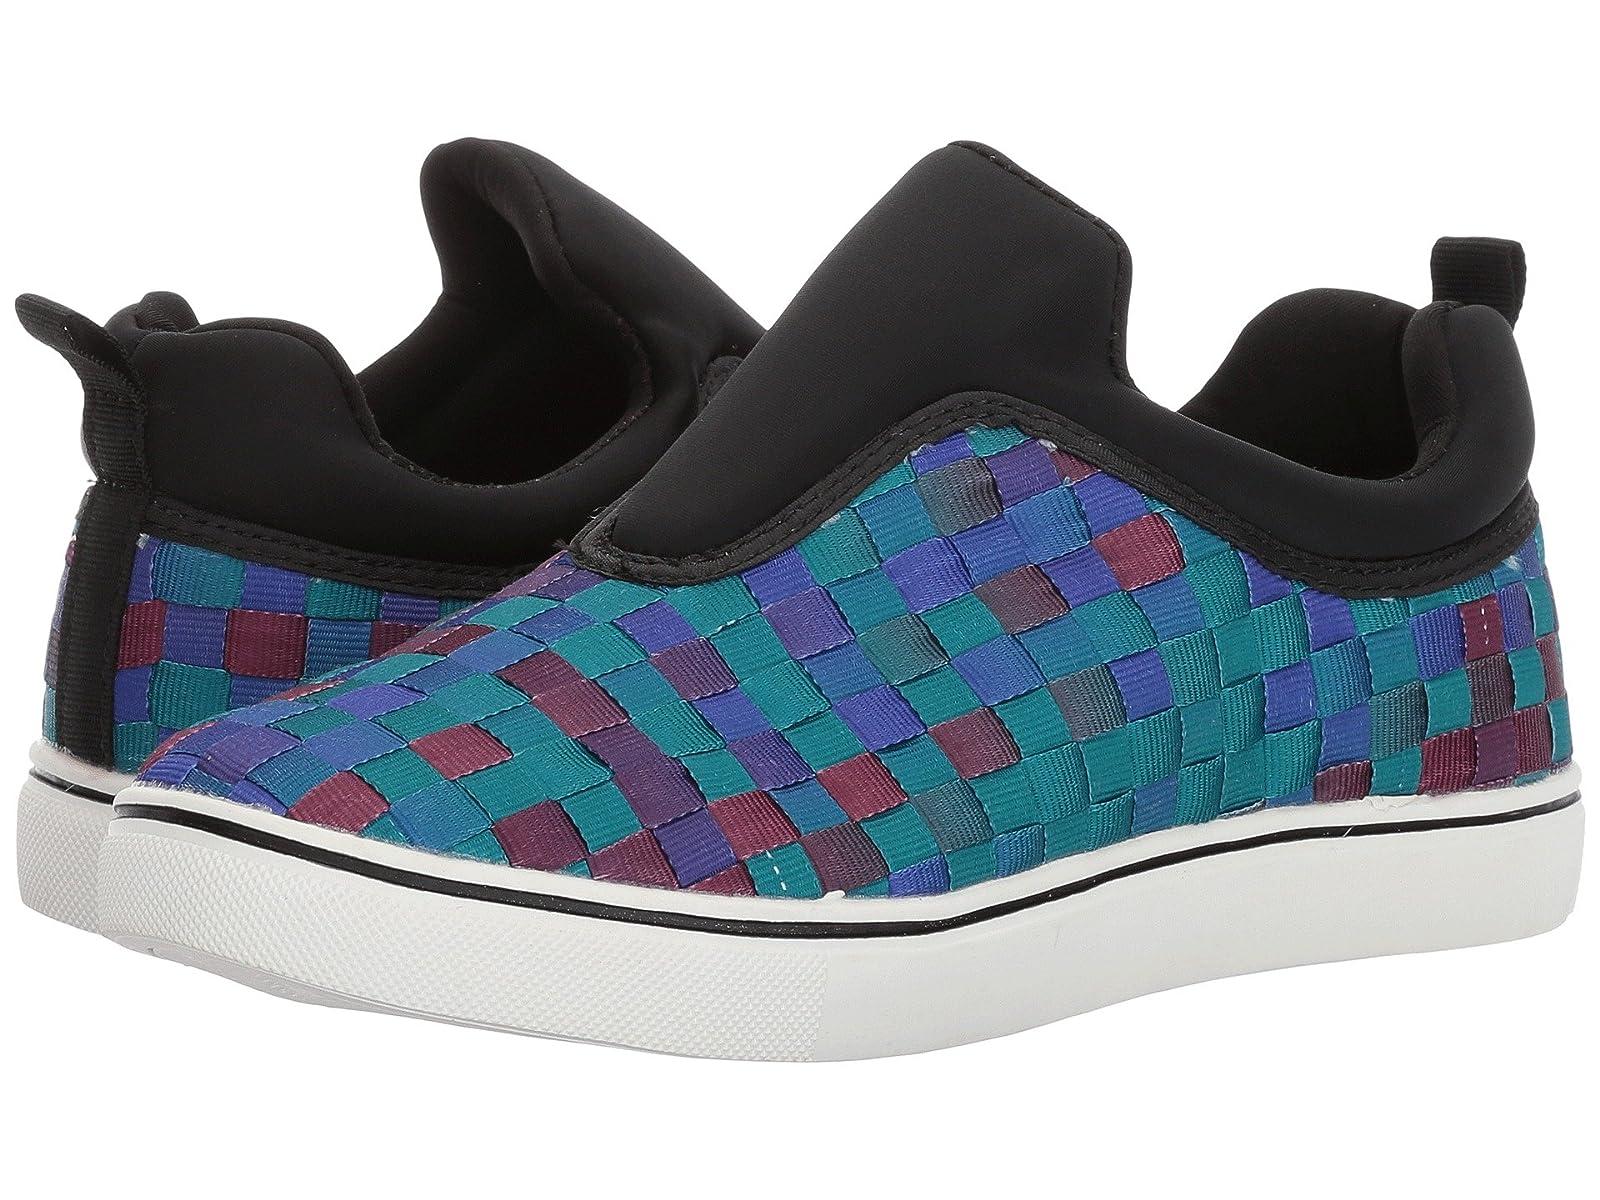 bernie mev. JoanCheap and distinctive eye-catching shoes